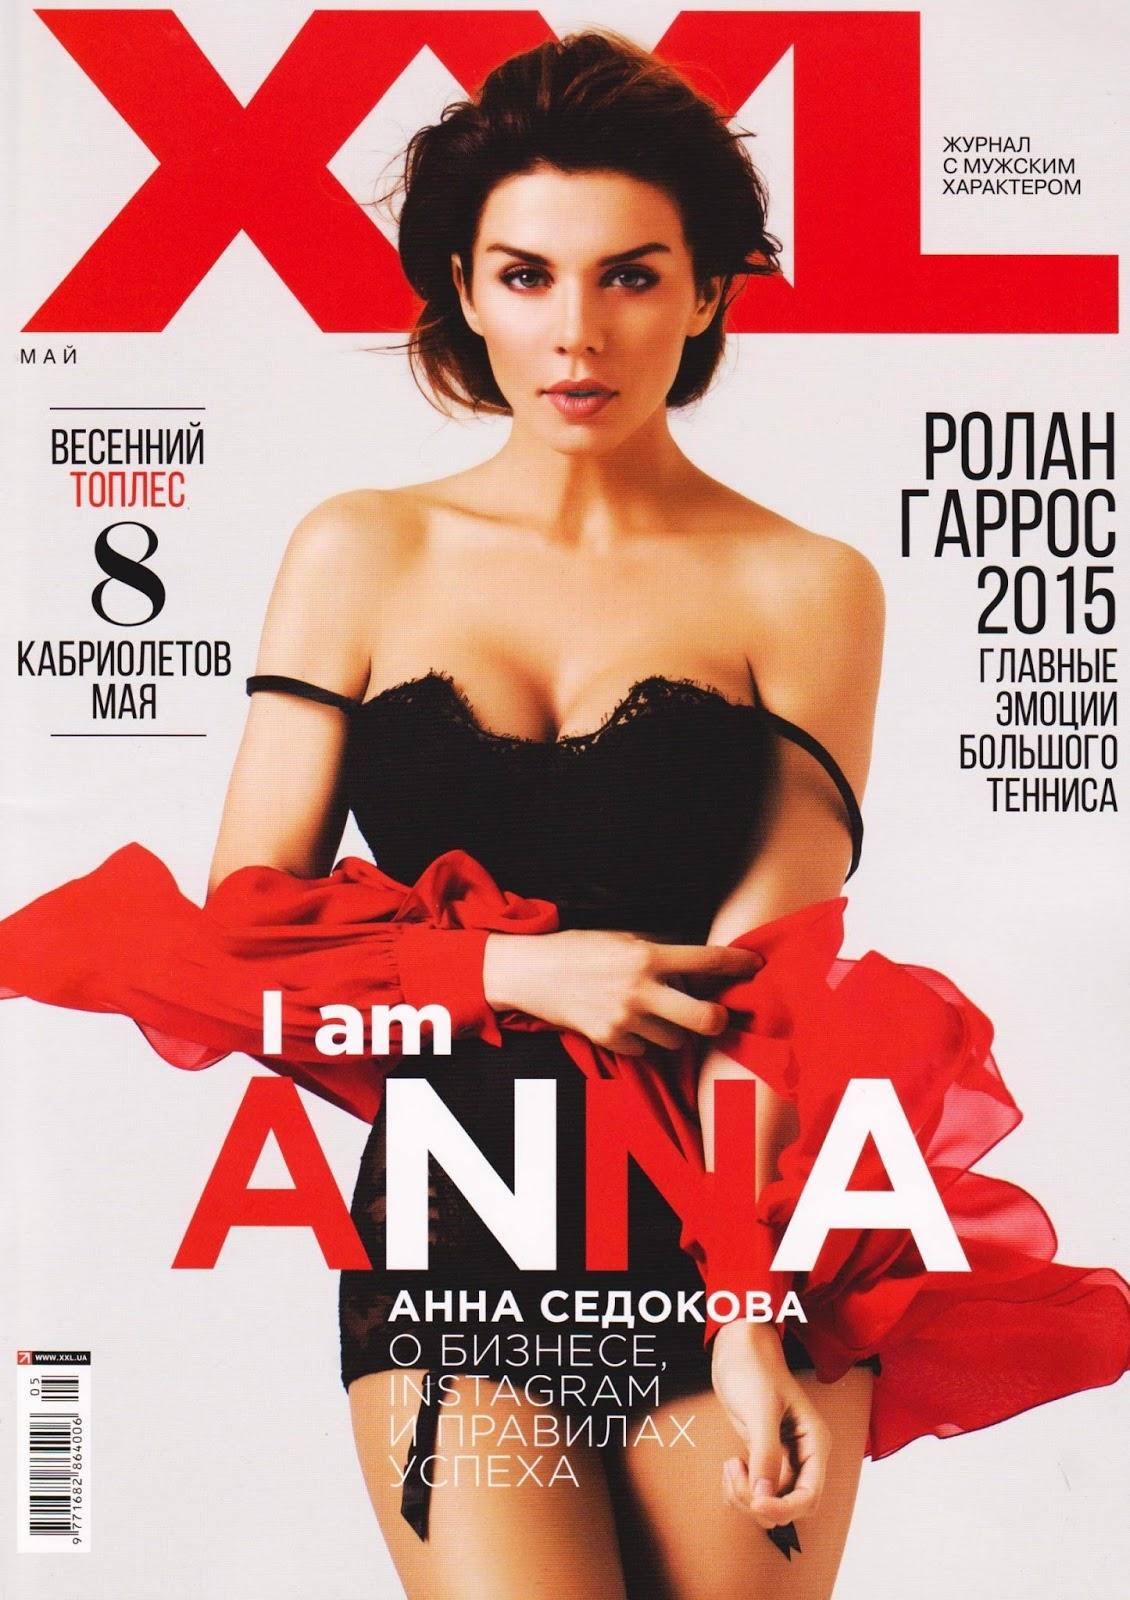 Singer @ Anna Sedokova - XXL Ukraine, May 2015